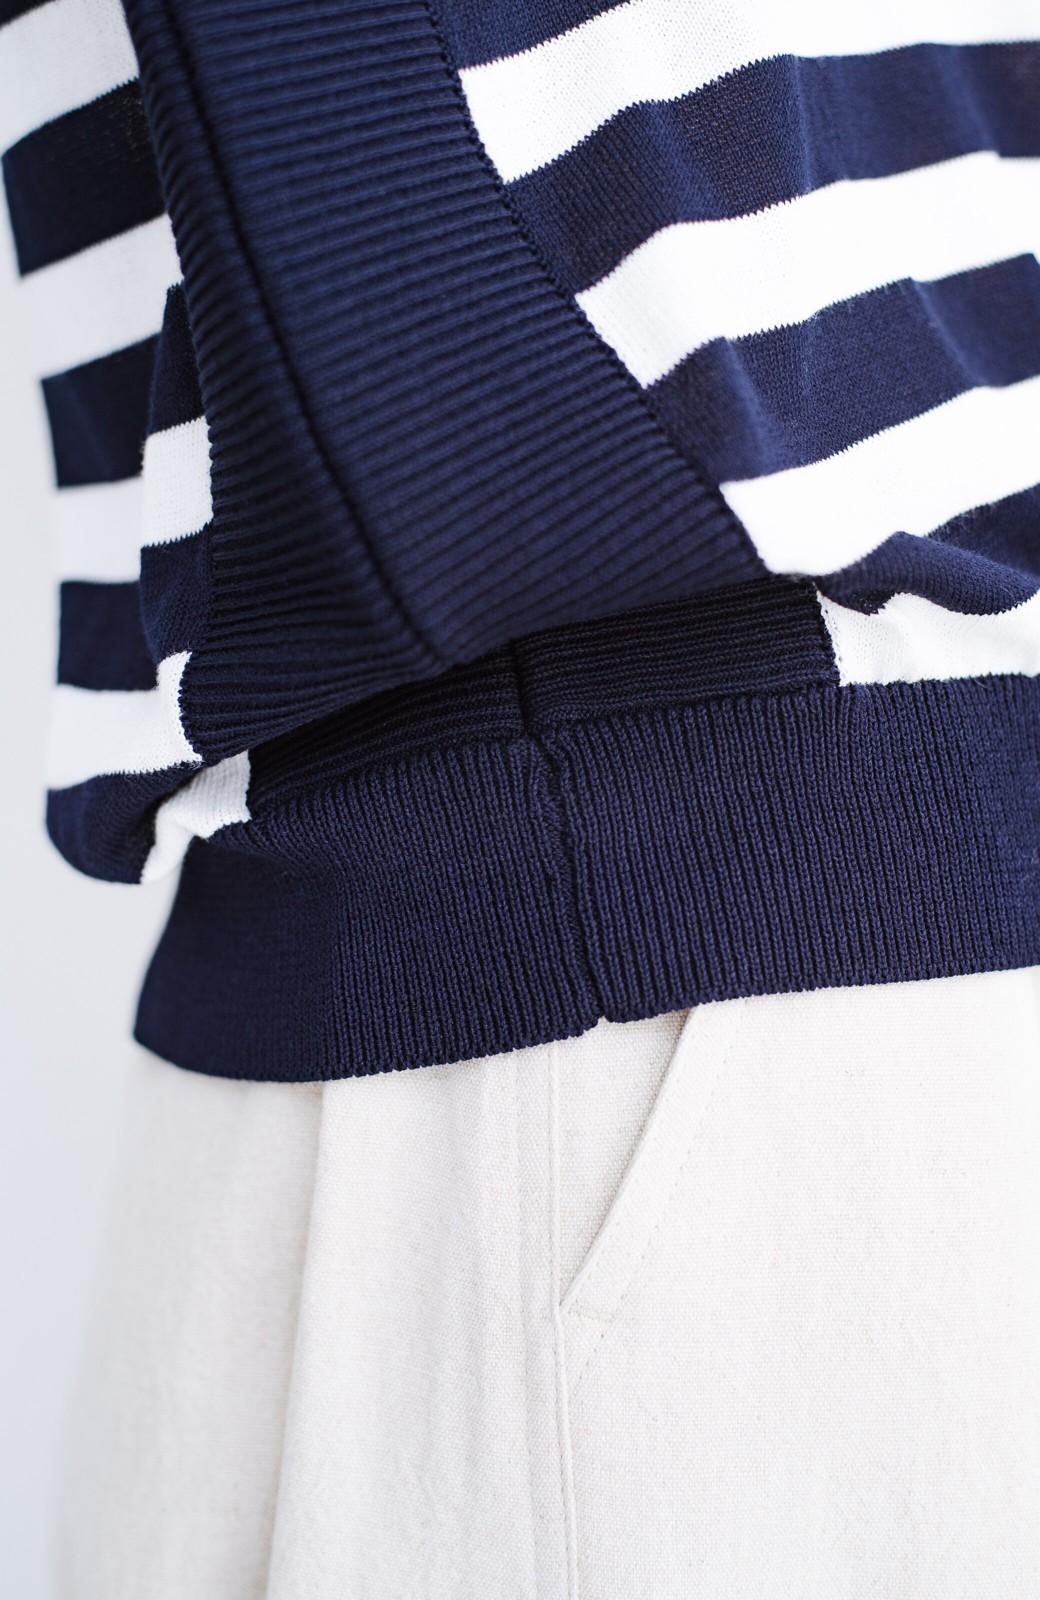 haco! カットソー感覚で着られる 洗えるオトナニットトップス by MAKORI <ブルー系その他>の商品写真6